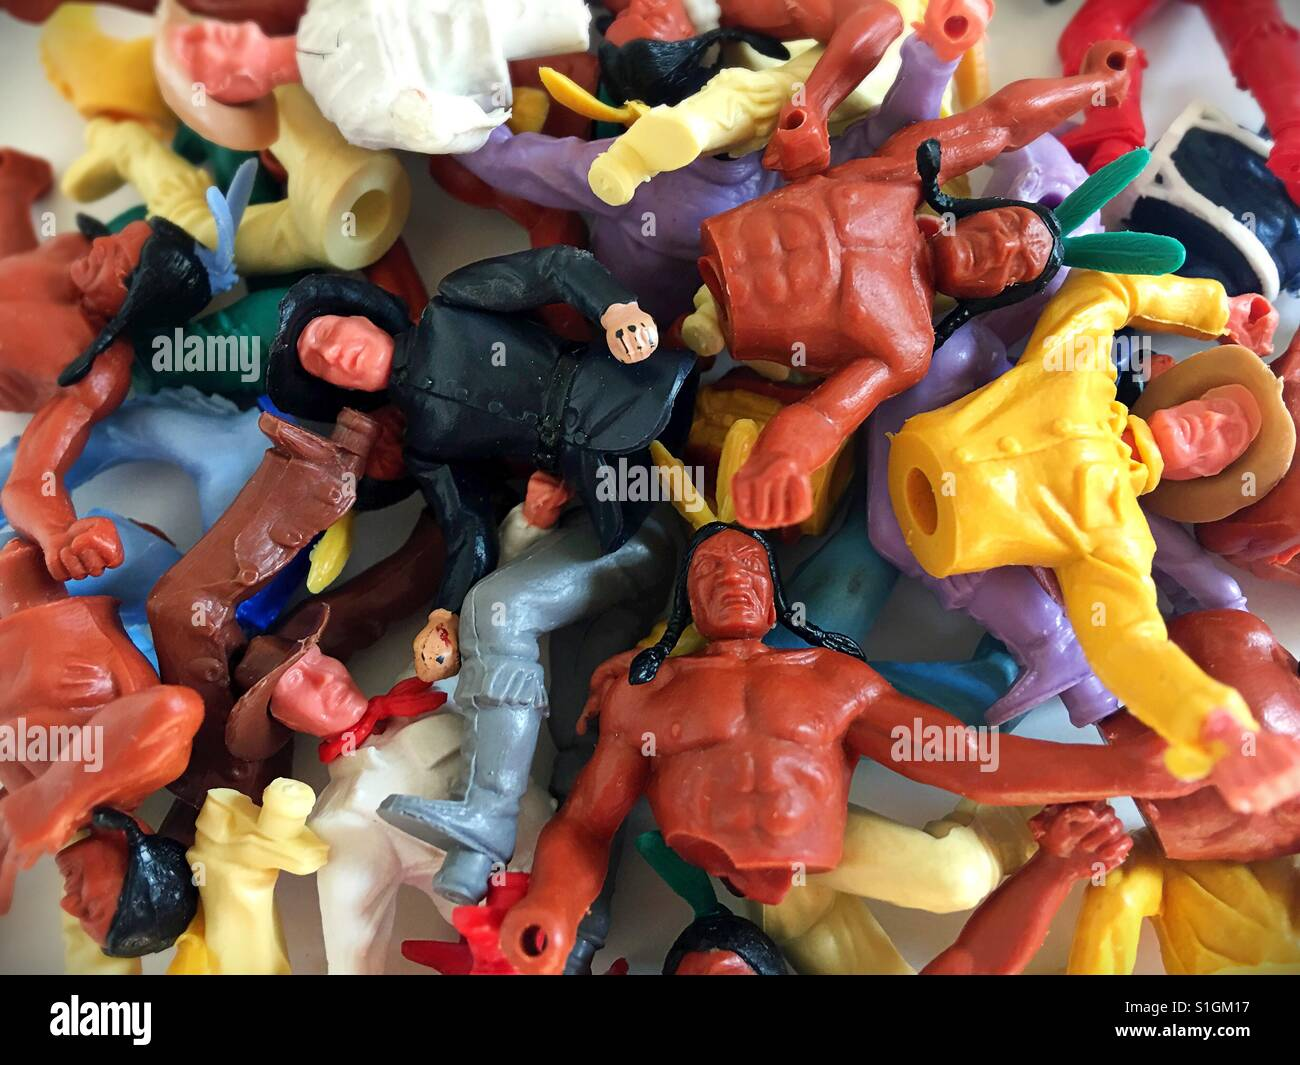 Vintage Plastic Toys Stock Photos & Vintage Plastic Toys Stock